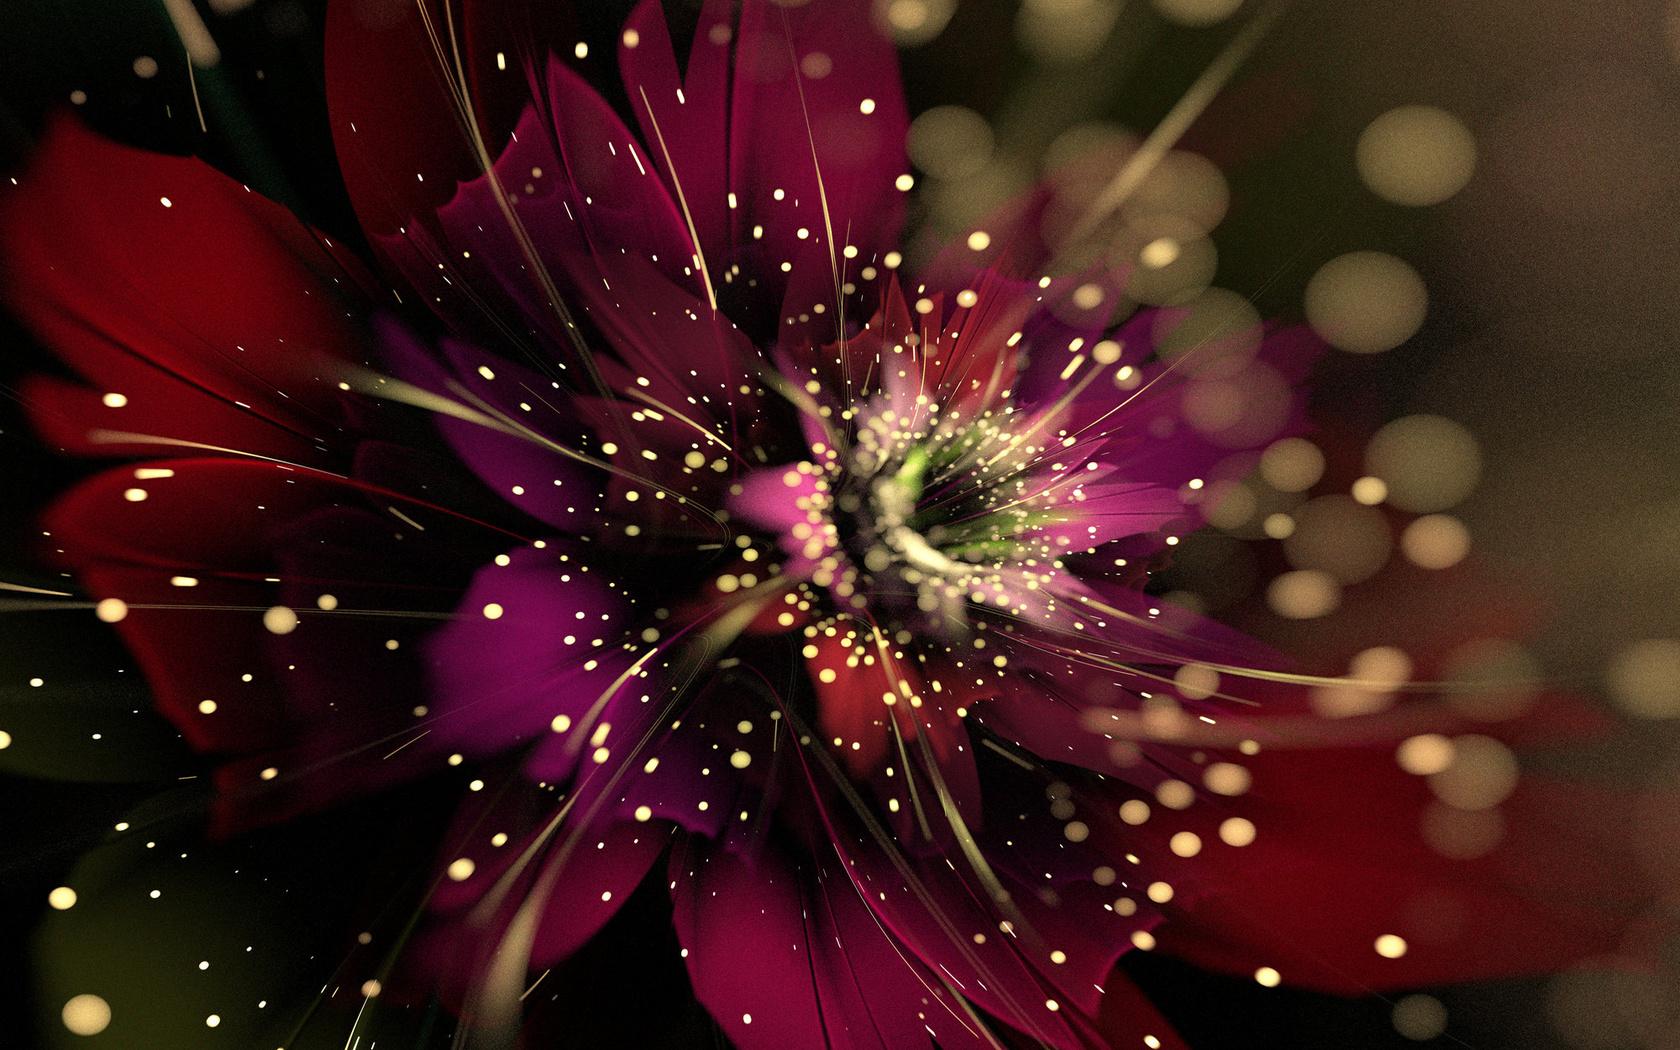 3d, графика, фракталы, цветок, абстракция, боке